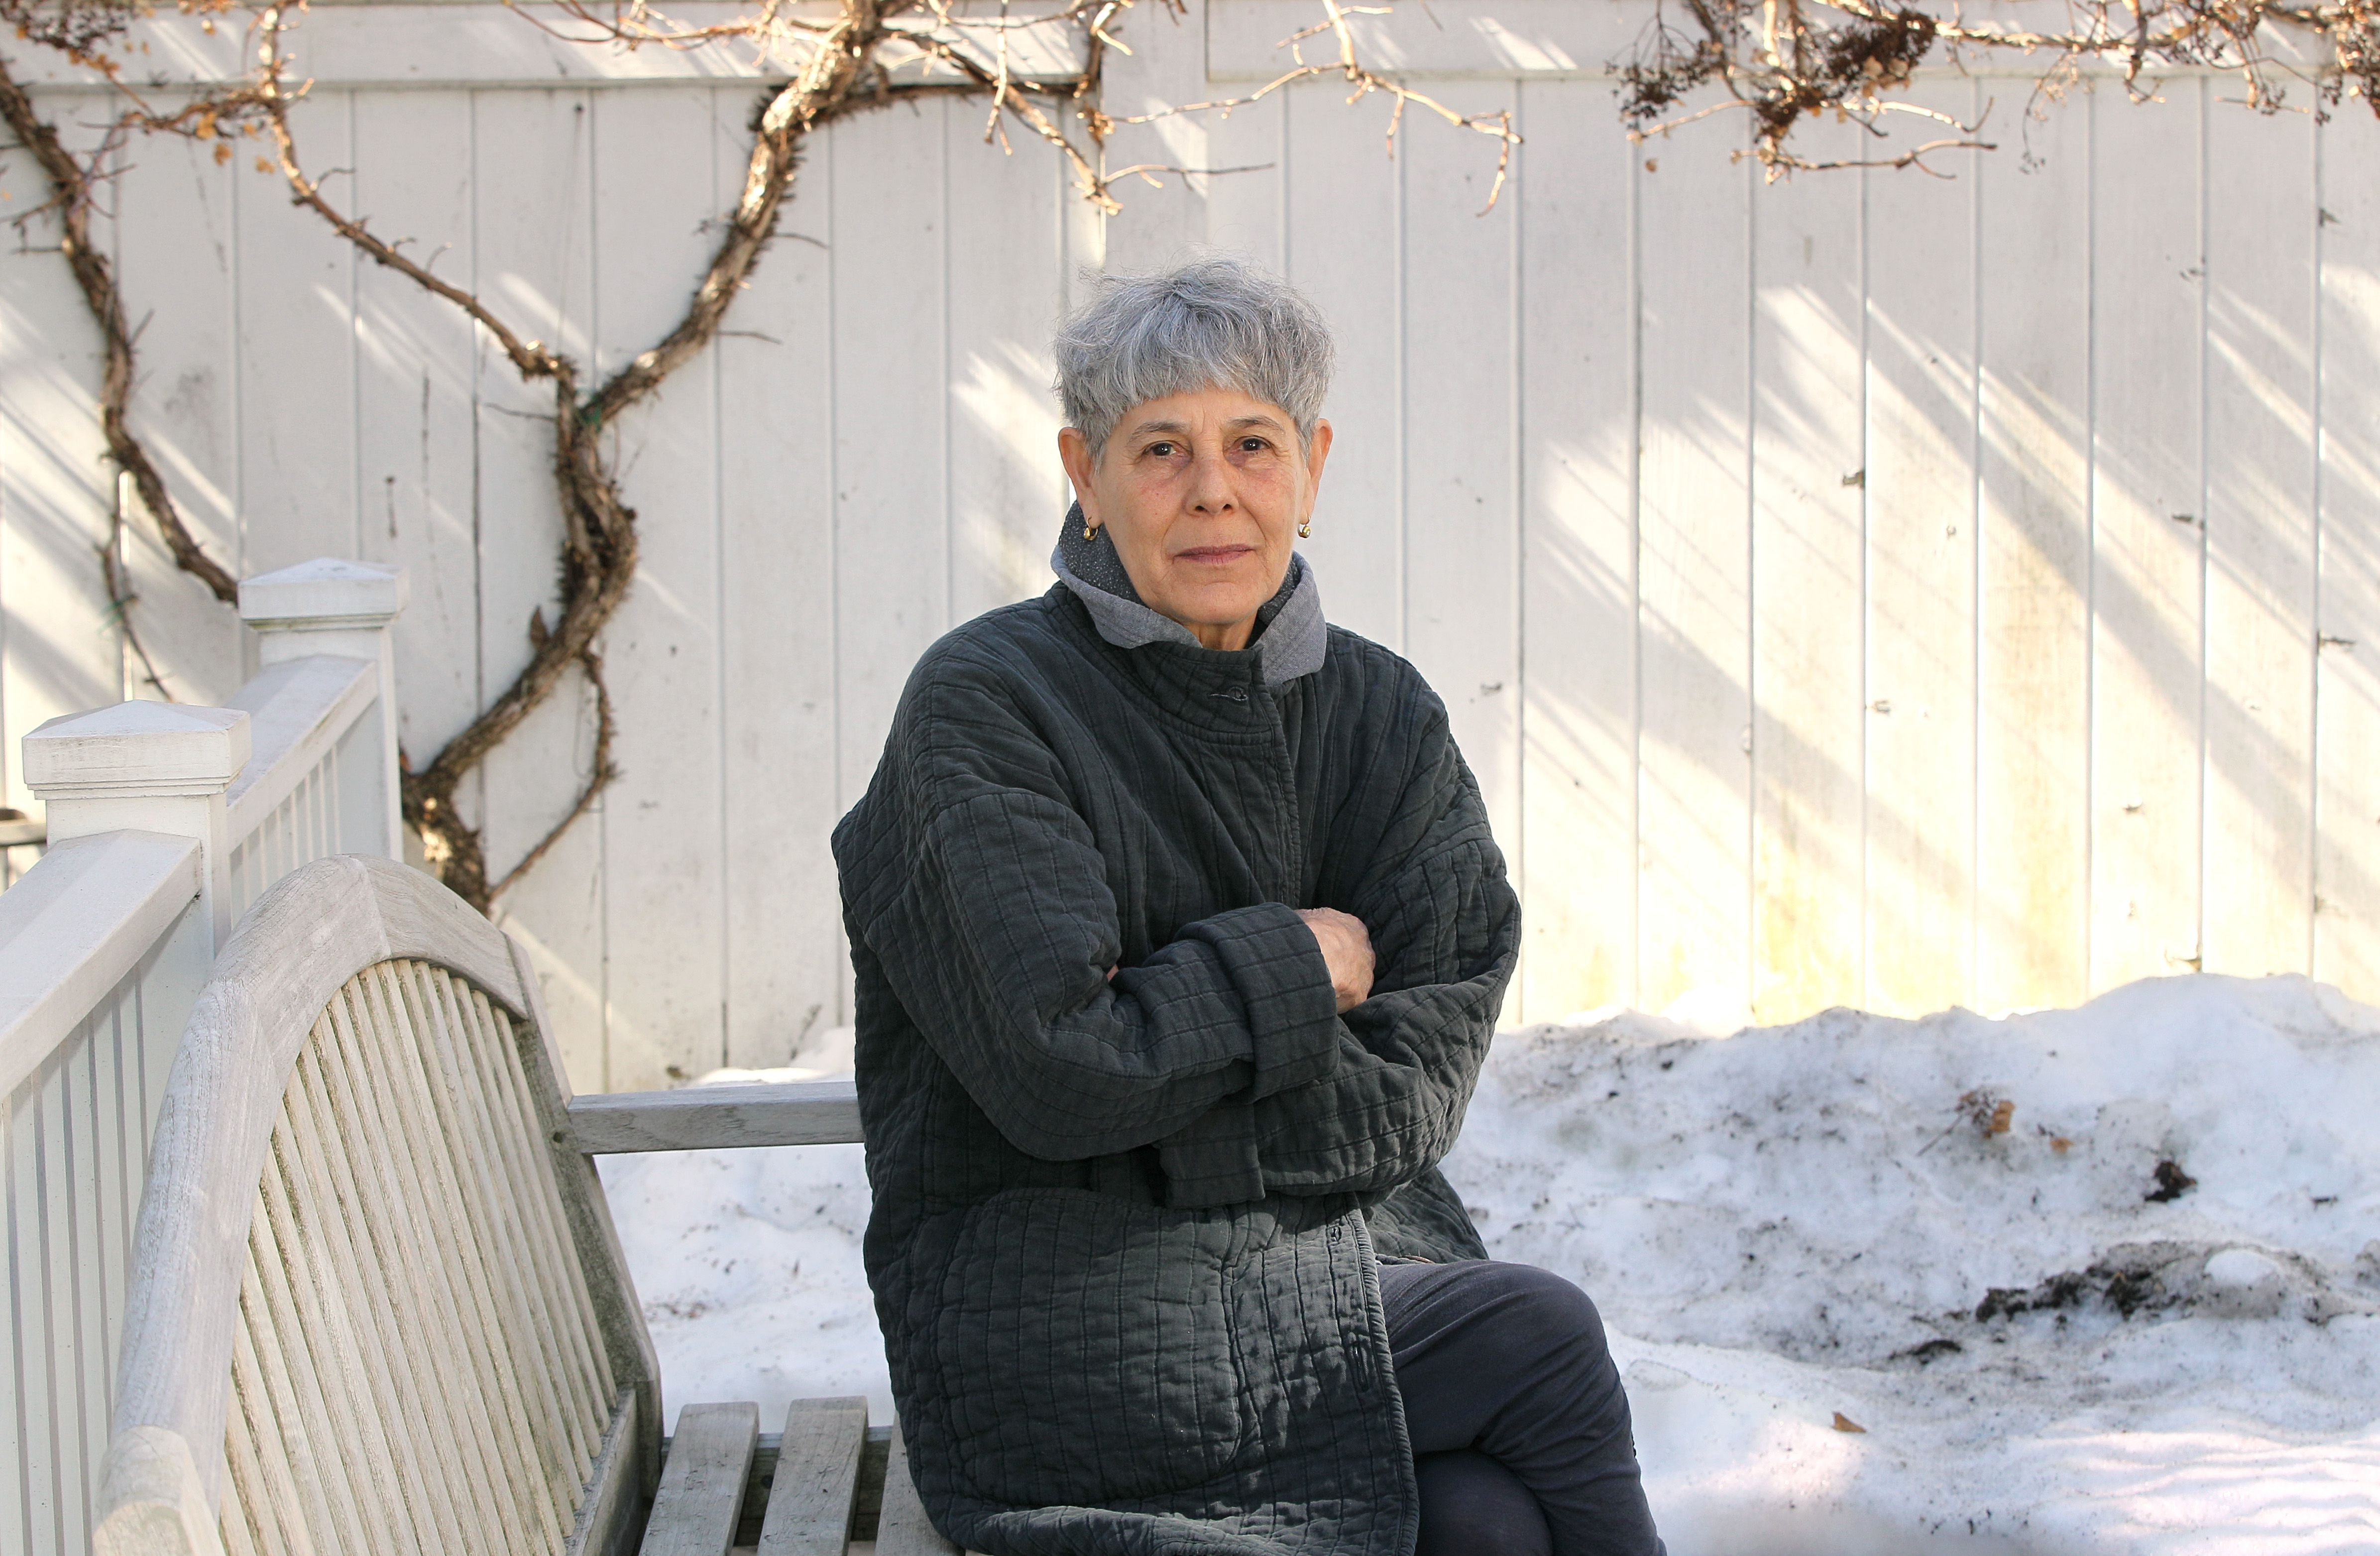 Susanna Kaysen: The chronicler of 'Cambridge' - The Boston Globe